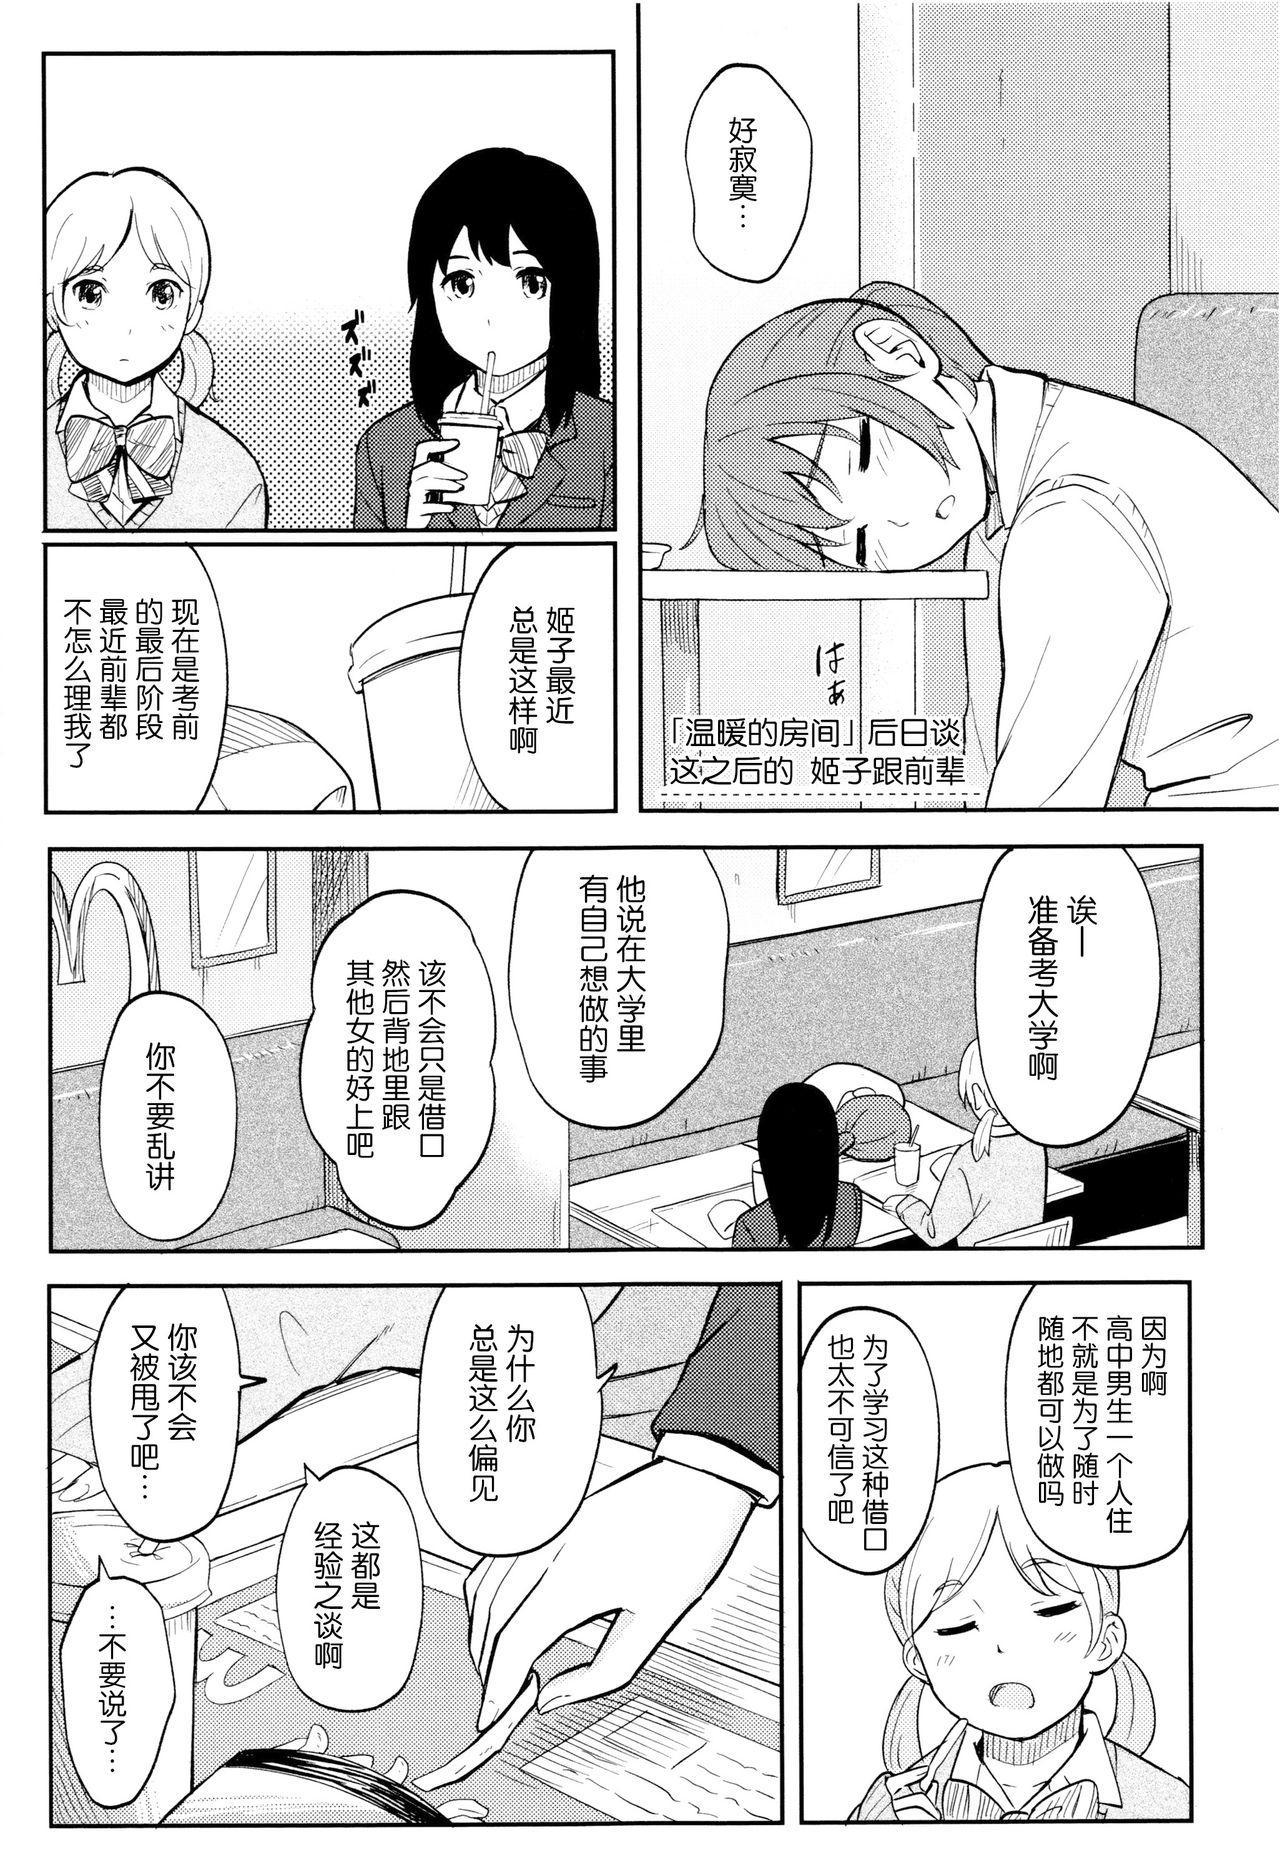 Tokubetsu na Mainichi - Special daily 167